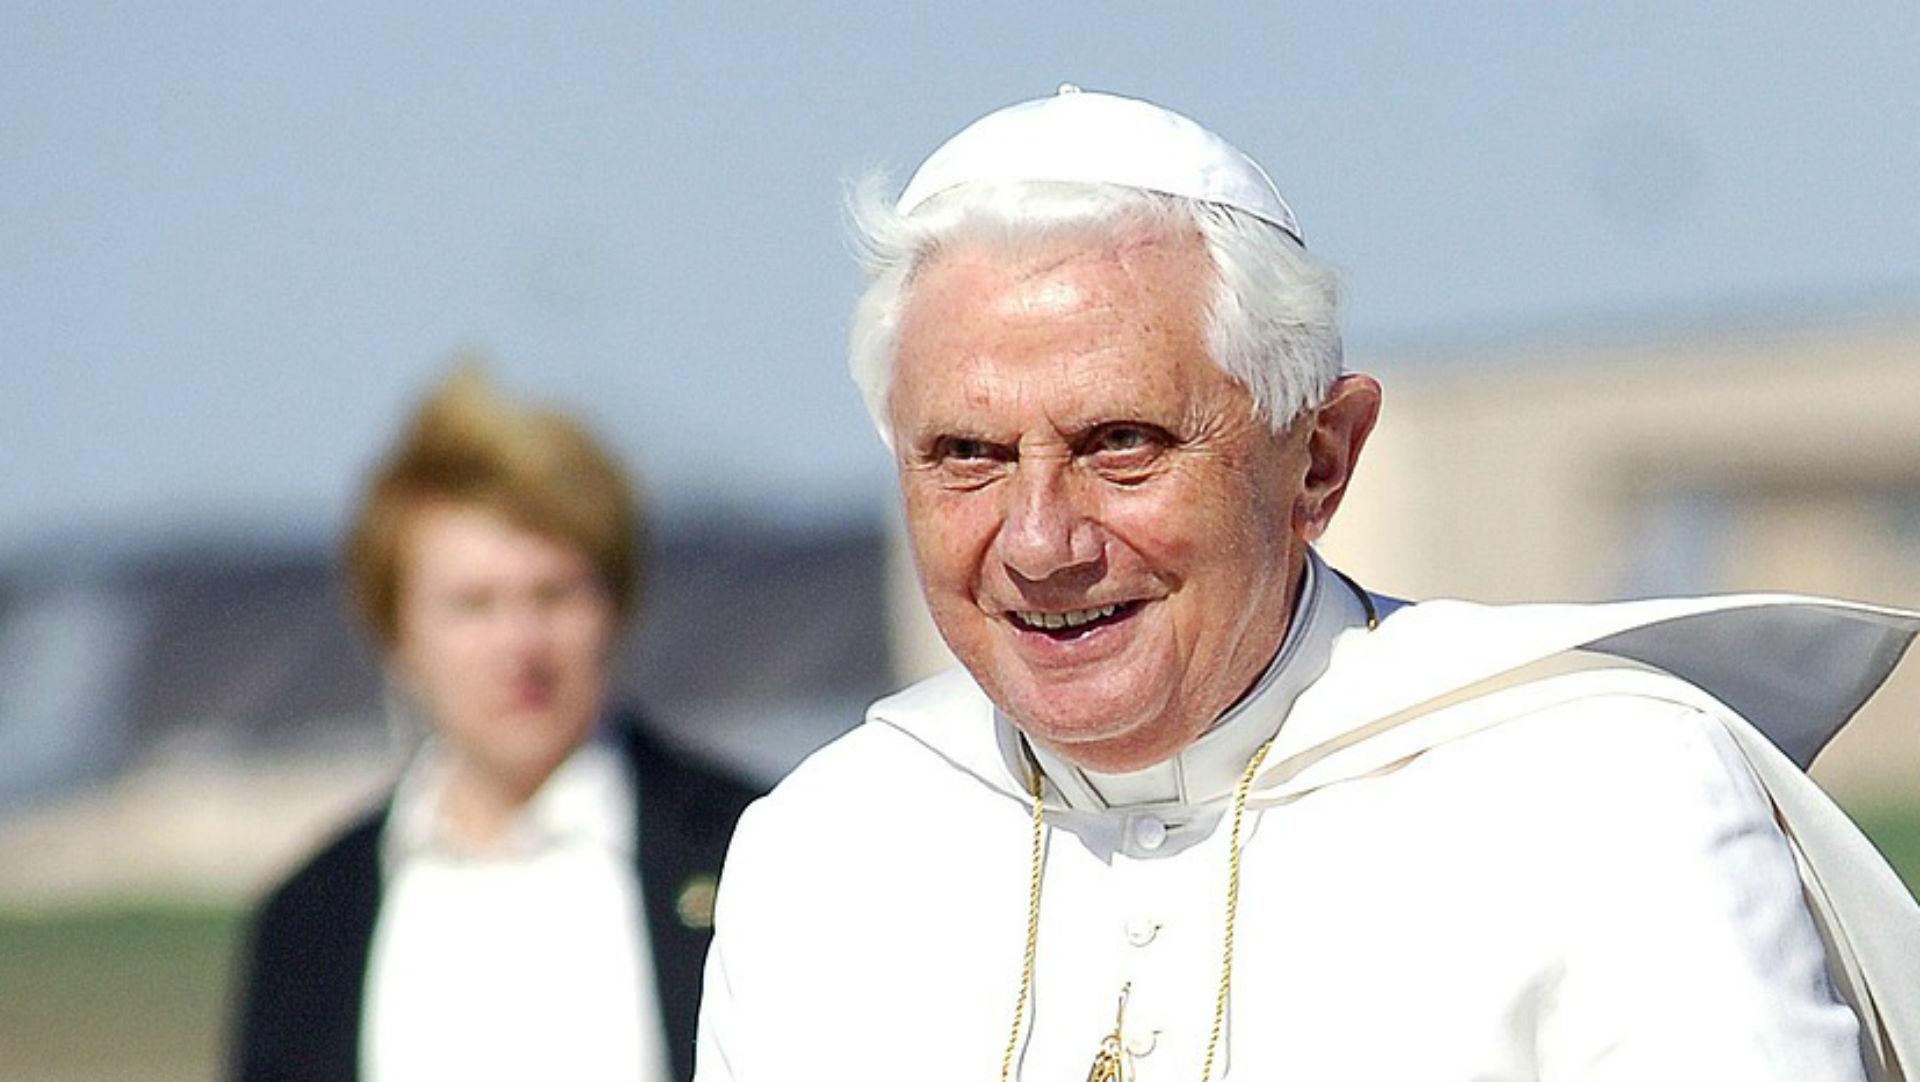 Der emeritierte Papst Benedikt | © pixabay.com CC0